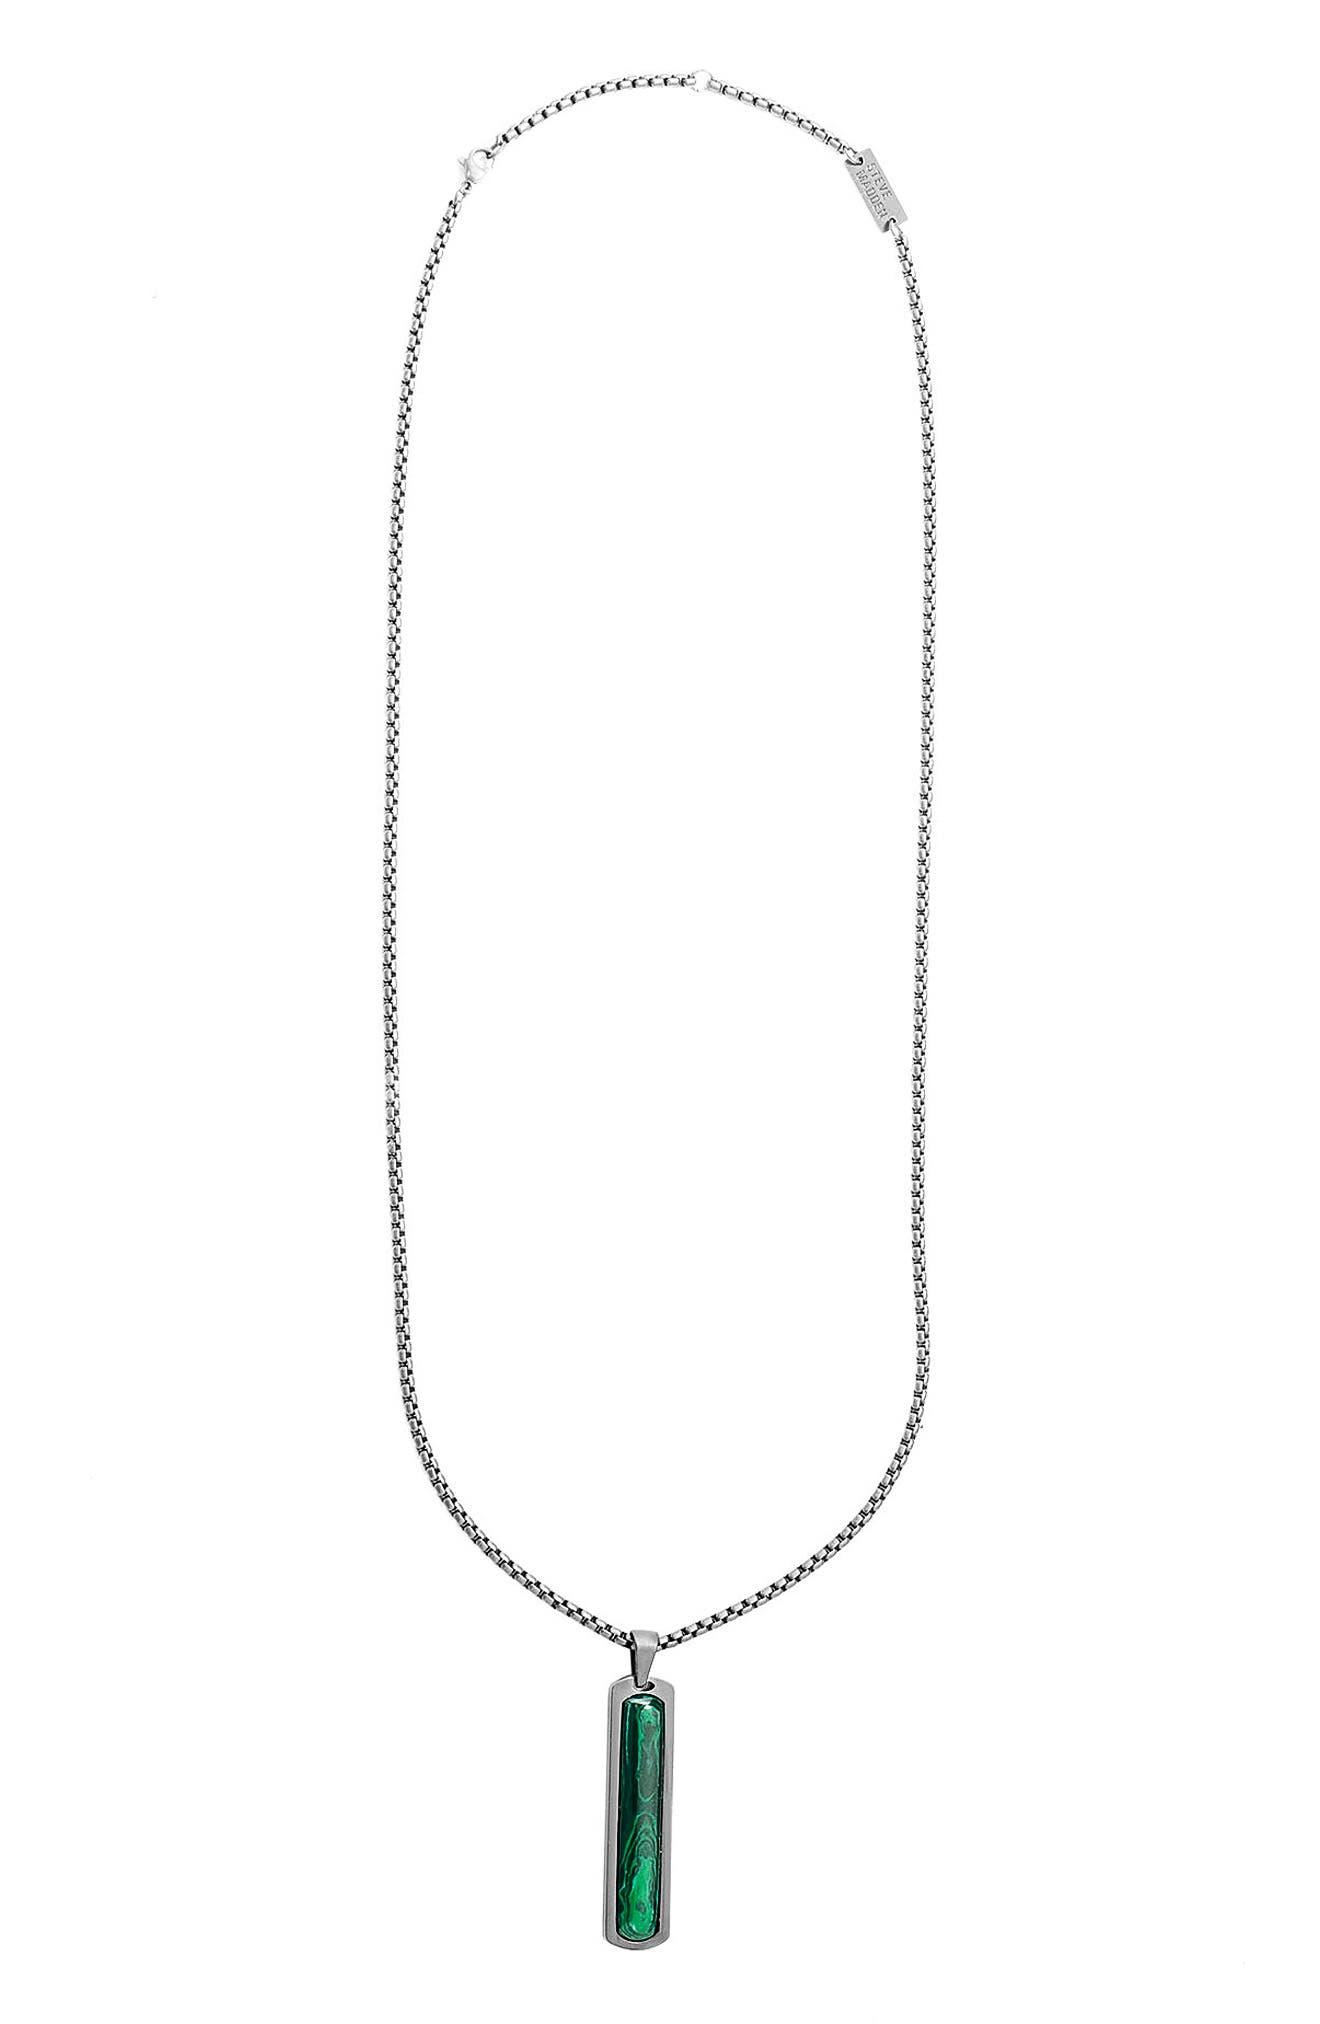 Steve Madden Oxidized Malachite Pendant Necklace